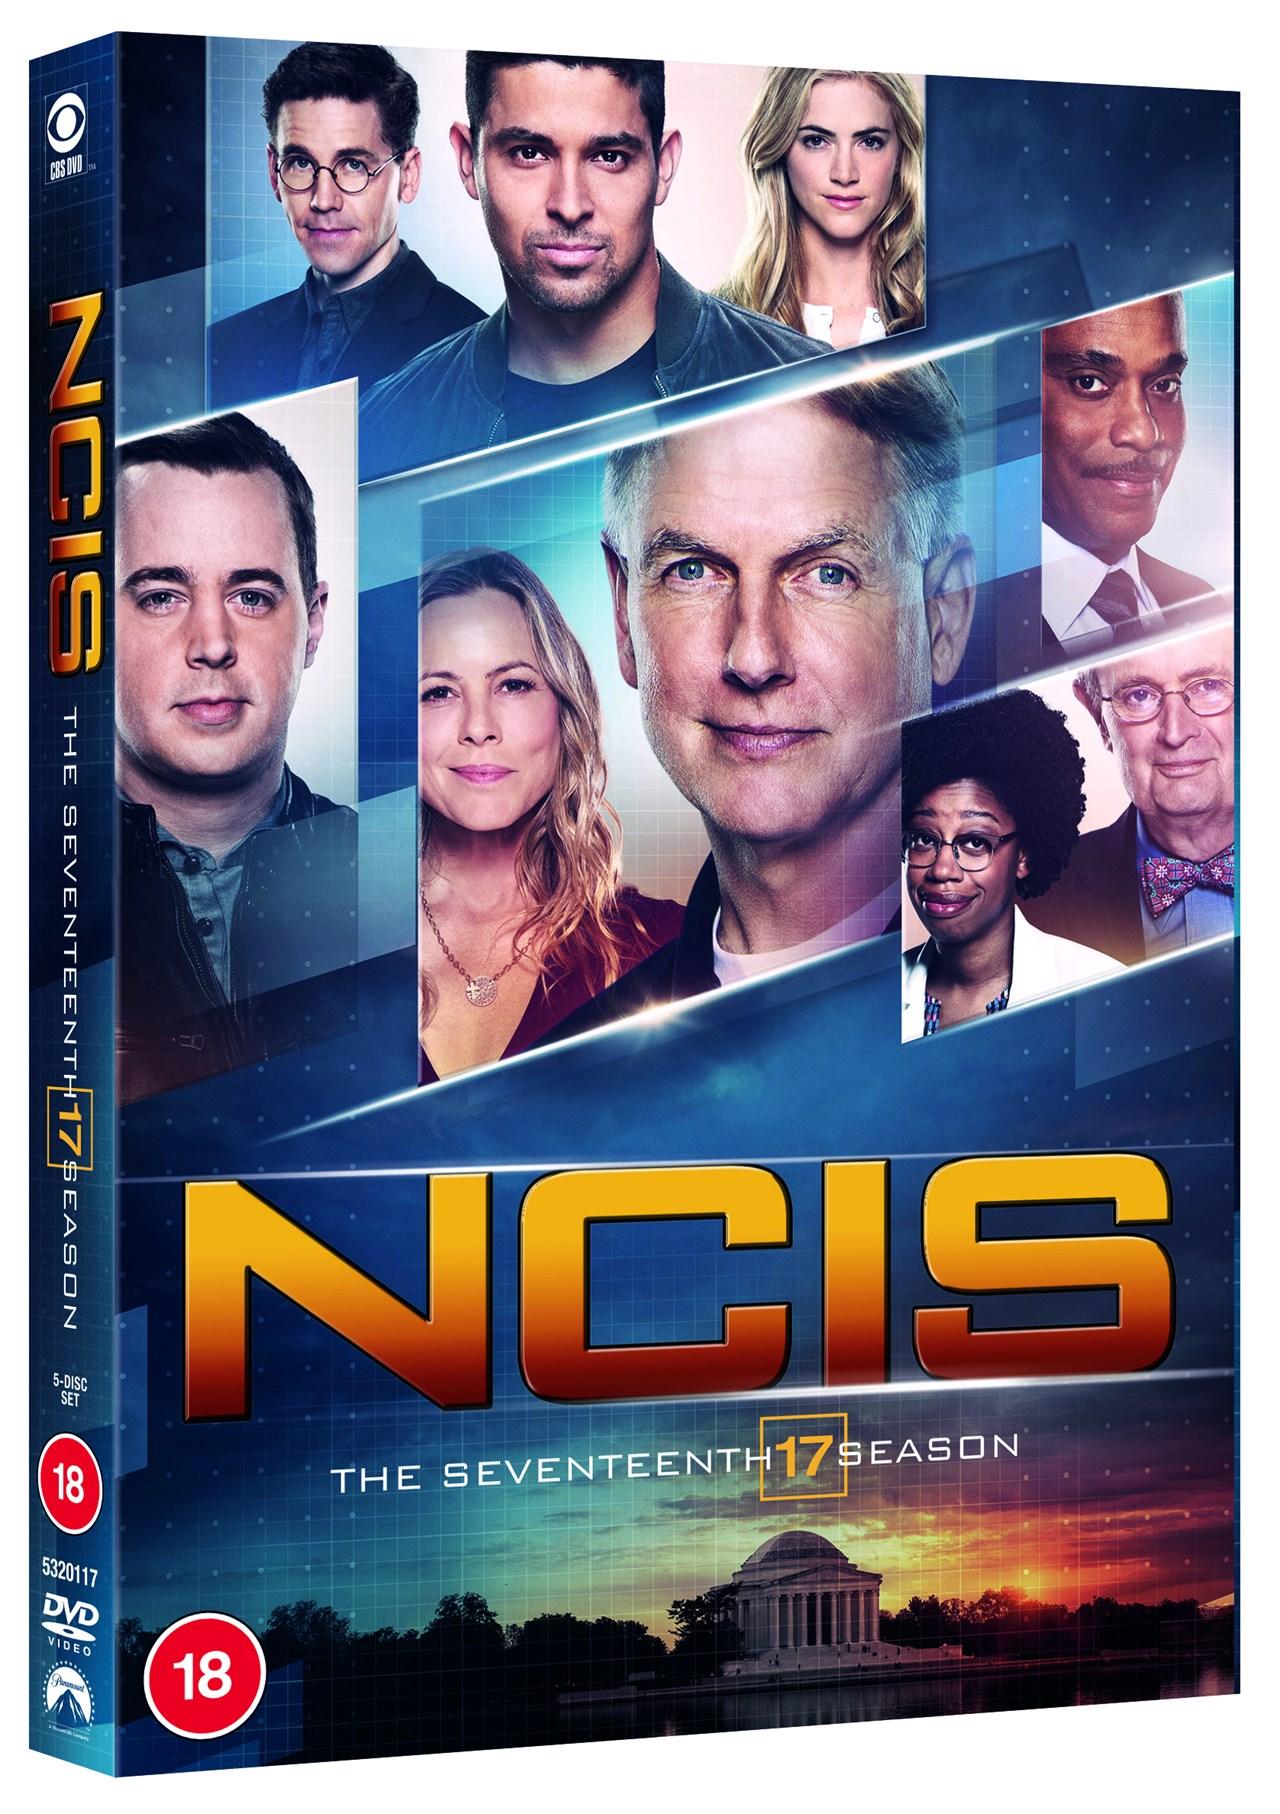 NCIS: The Seventeenth Season - 2